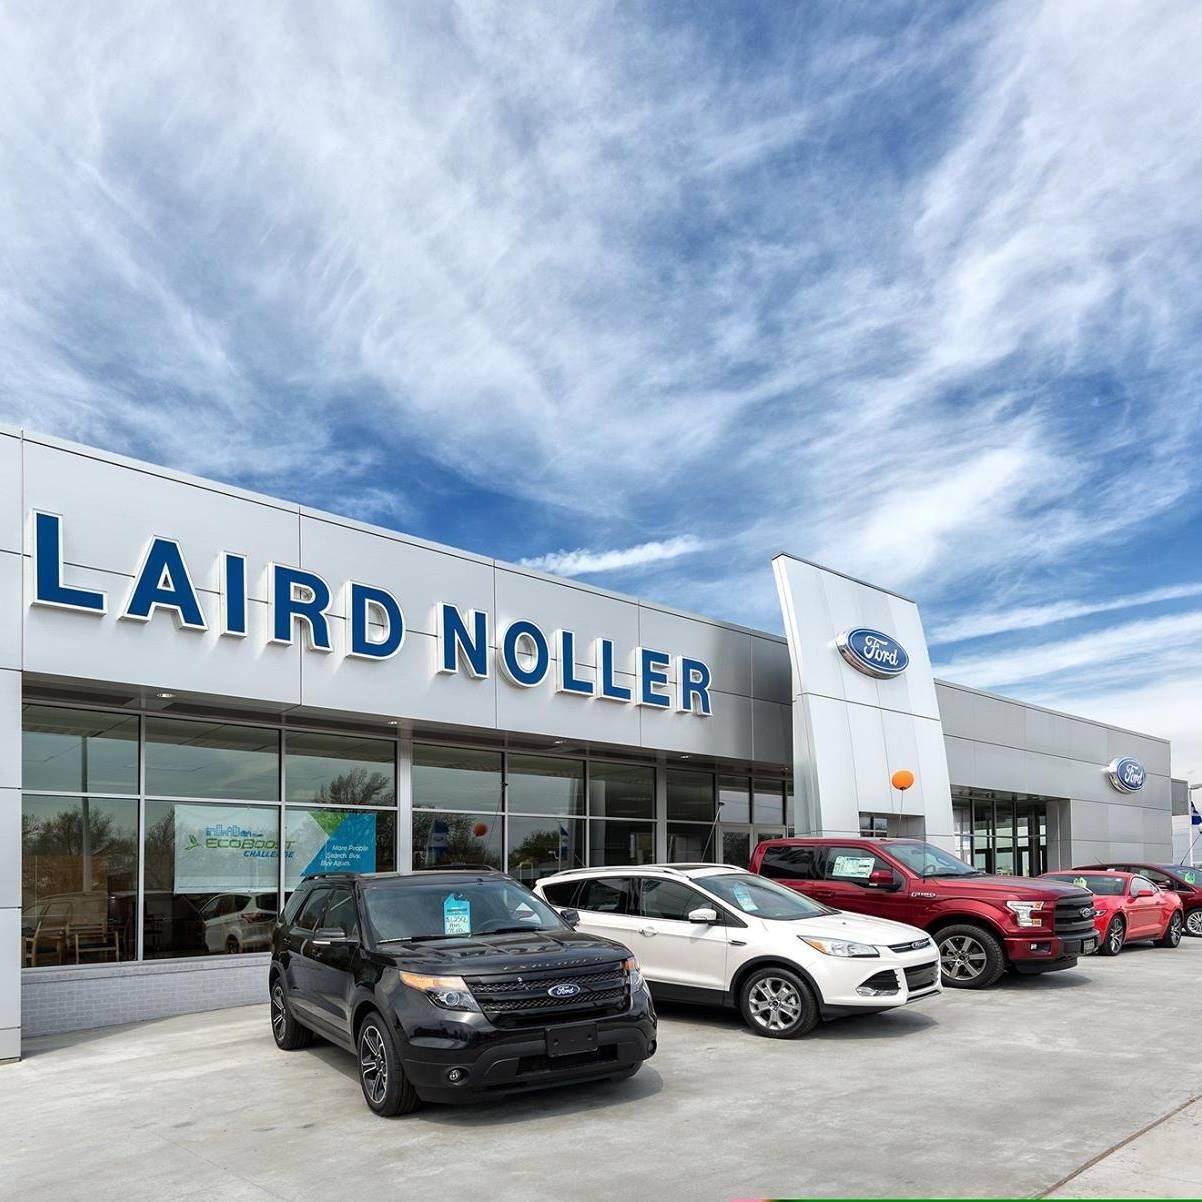 Laird Noller Ford Topeka, Topeka Kansas (KS